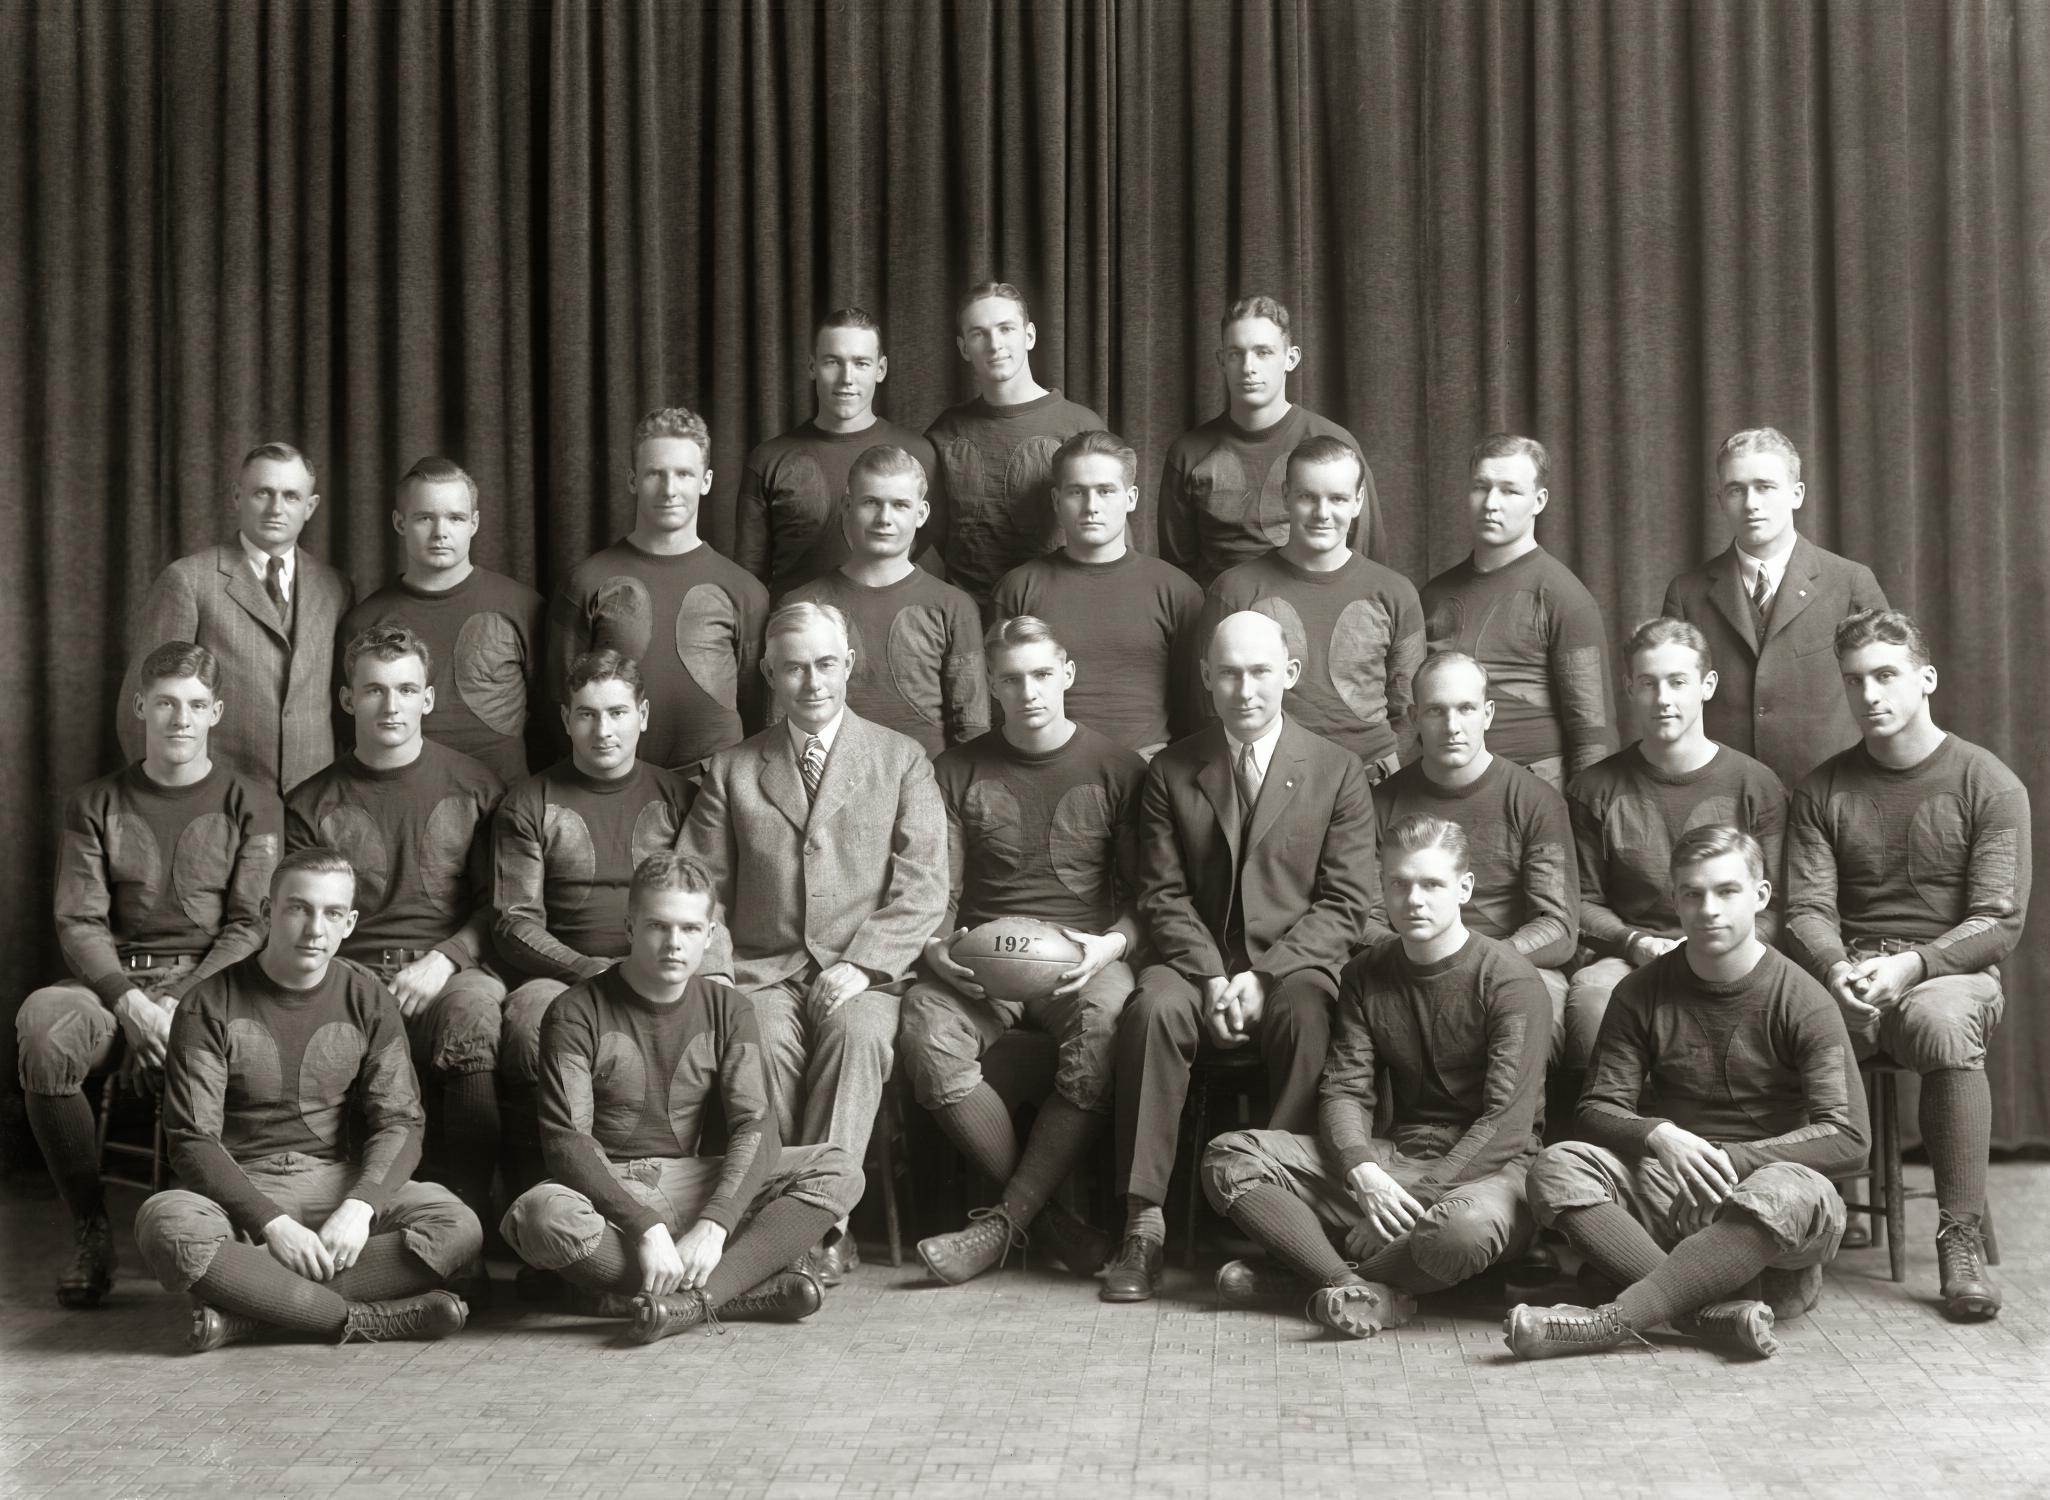 1927 Michigan Football Team | bigbluefootballhistory.com